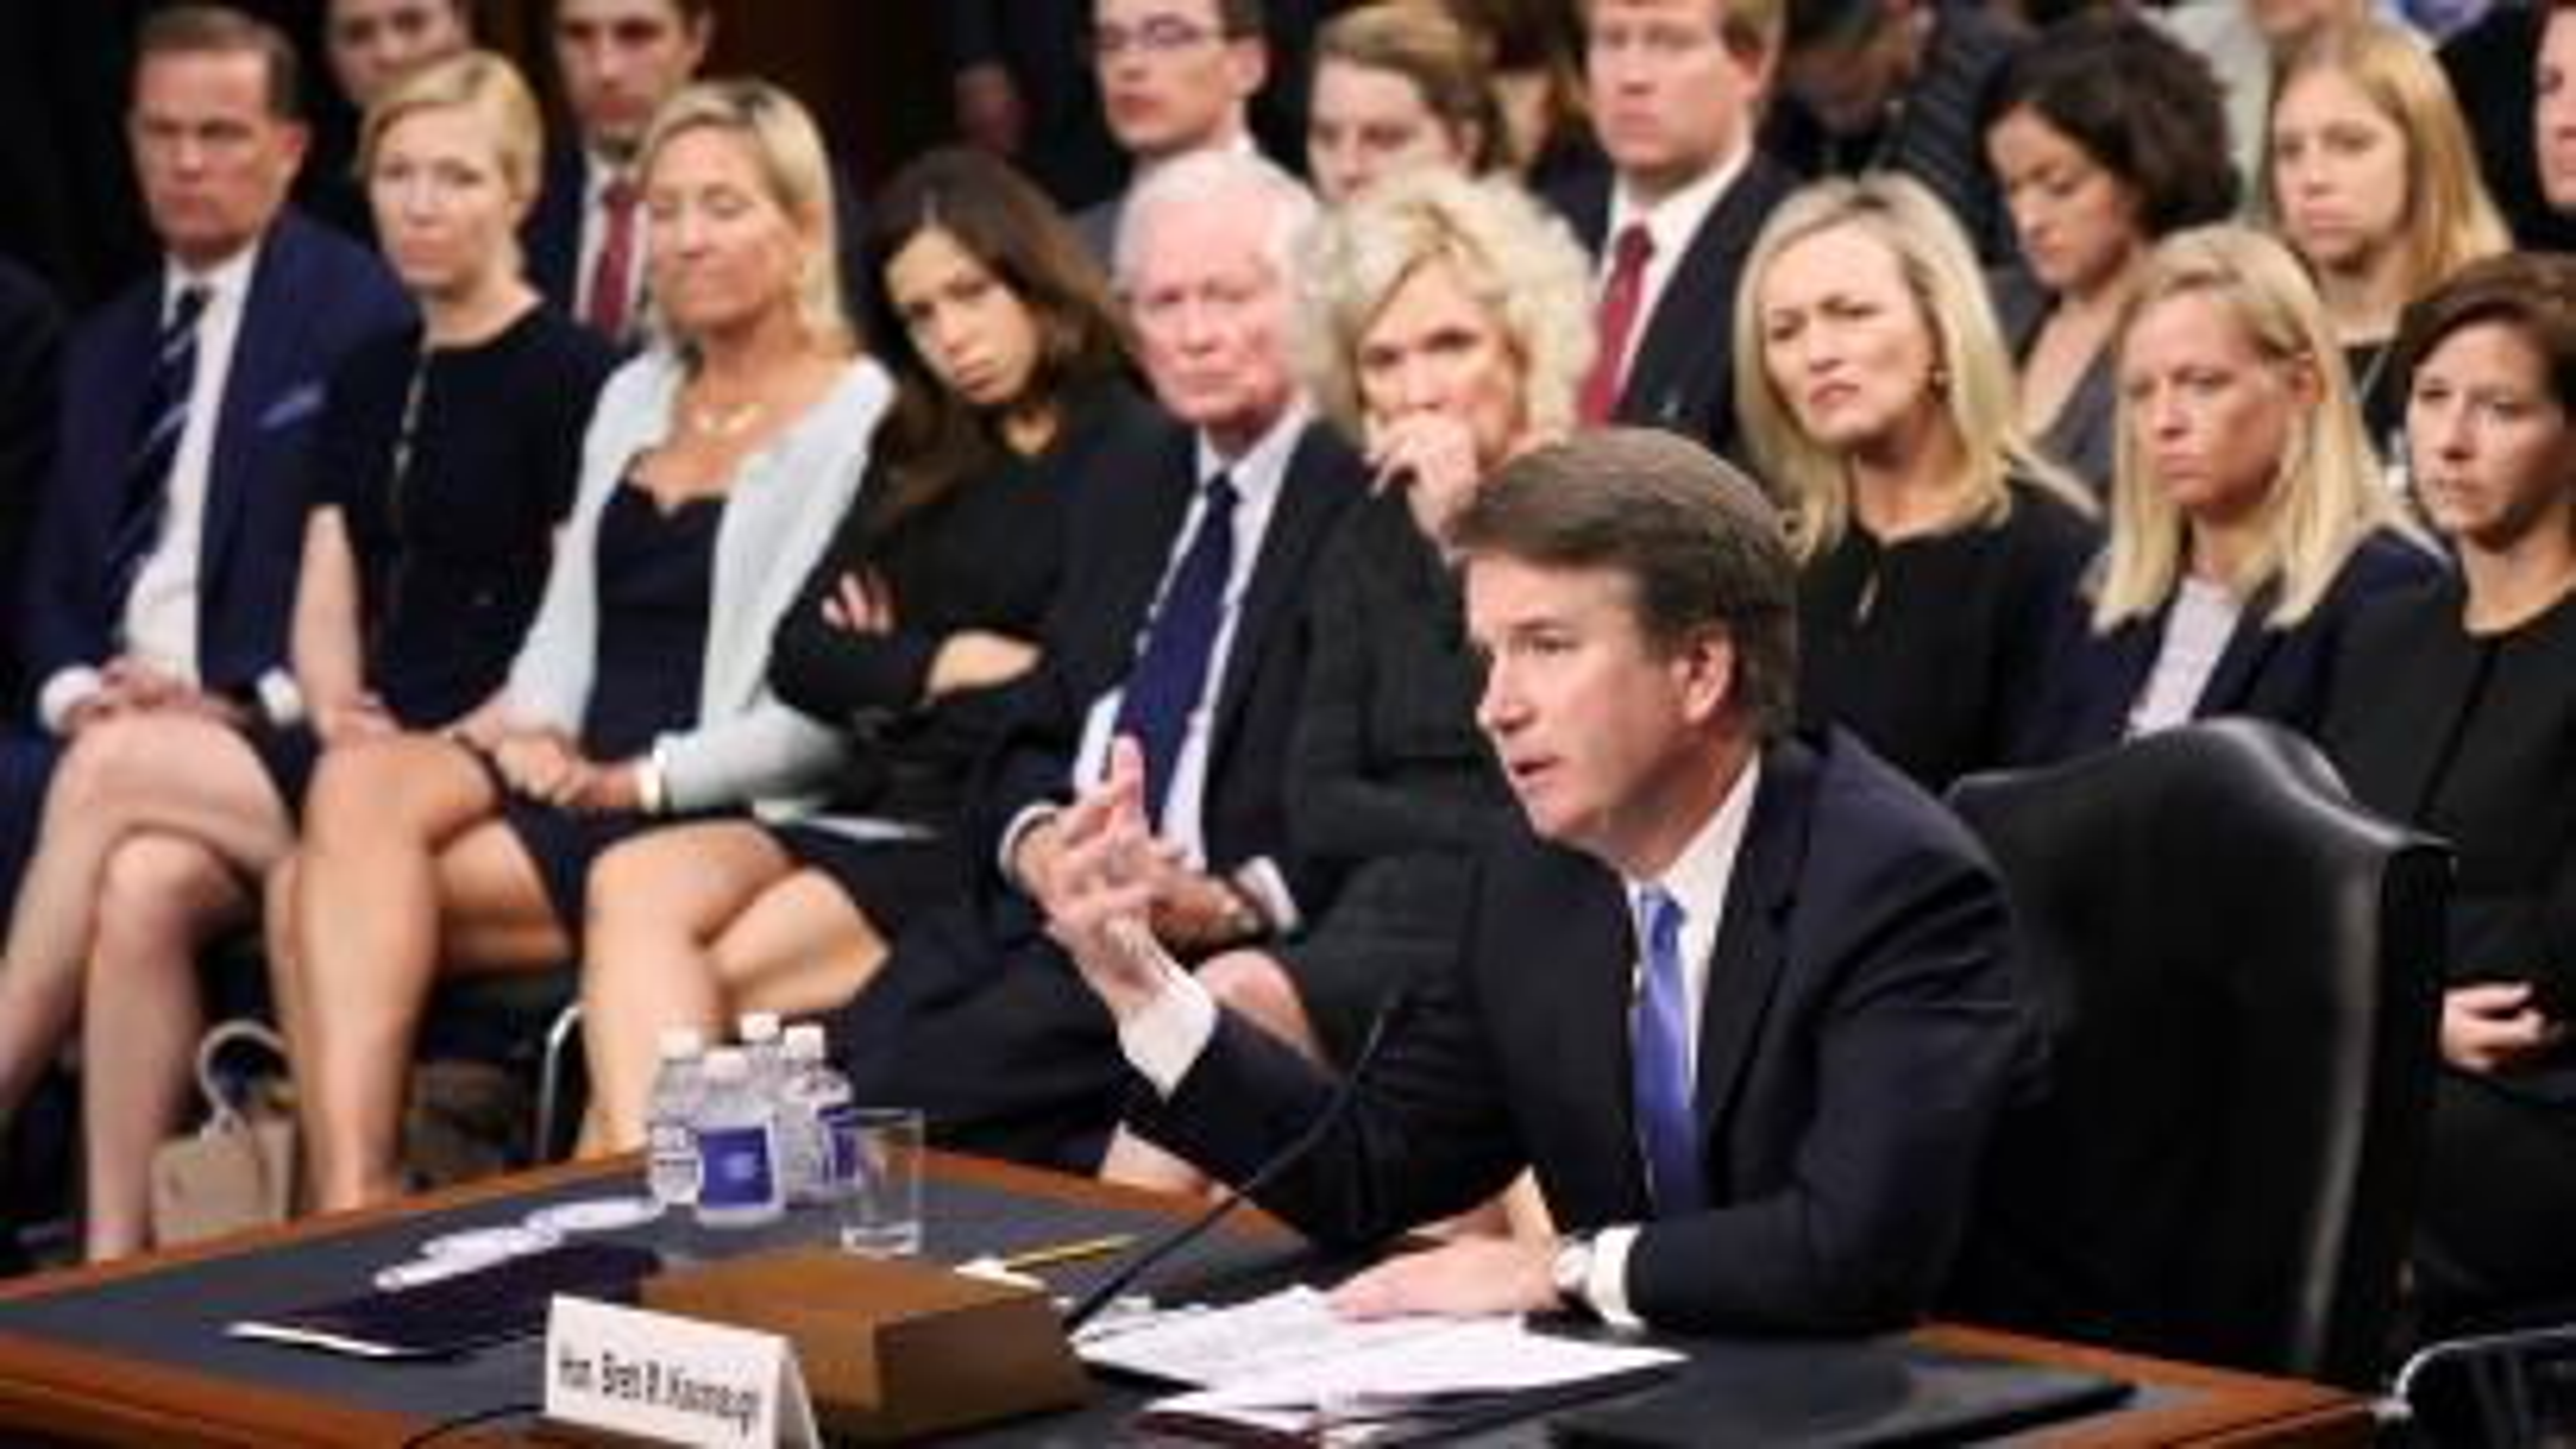 US Supreme Court nominee judge Brett Kavanaugh testifies.